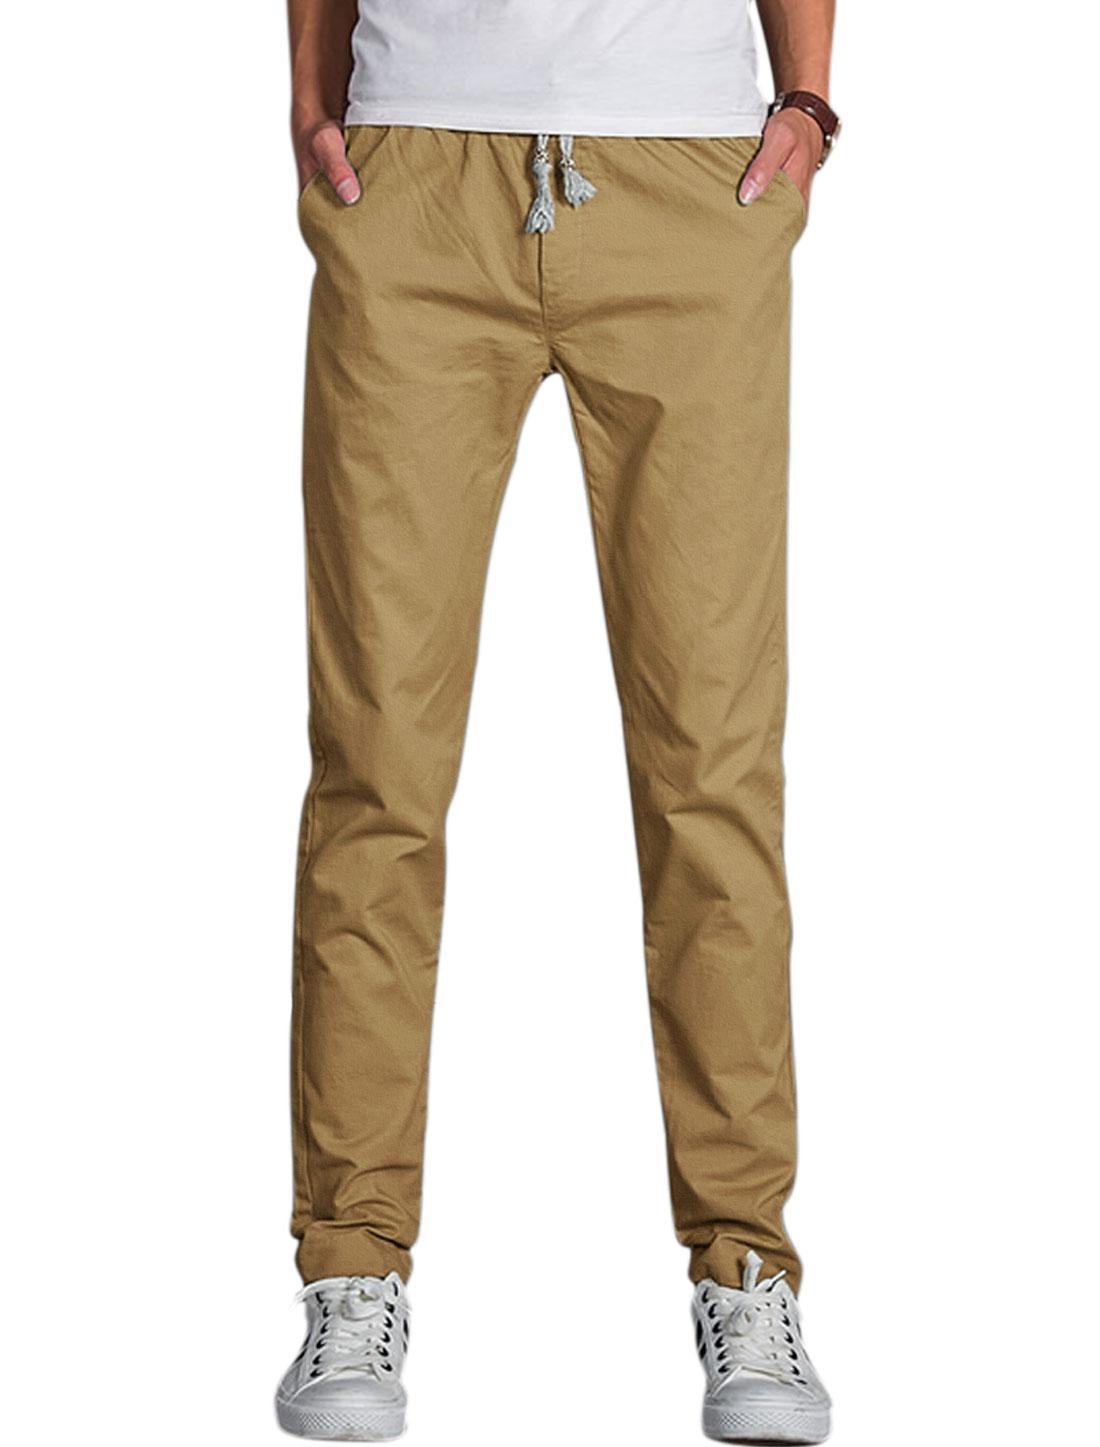 Men Elastic Waist One Pocket Back Casual Pants Khaki W30